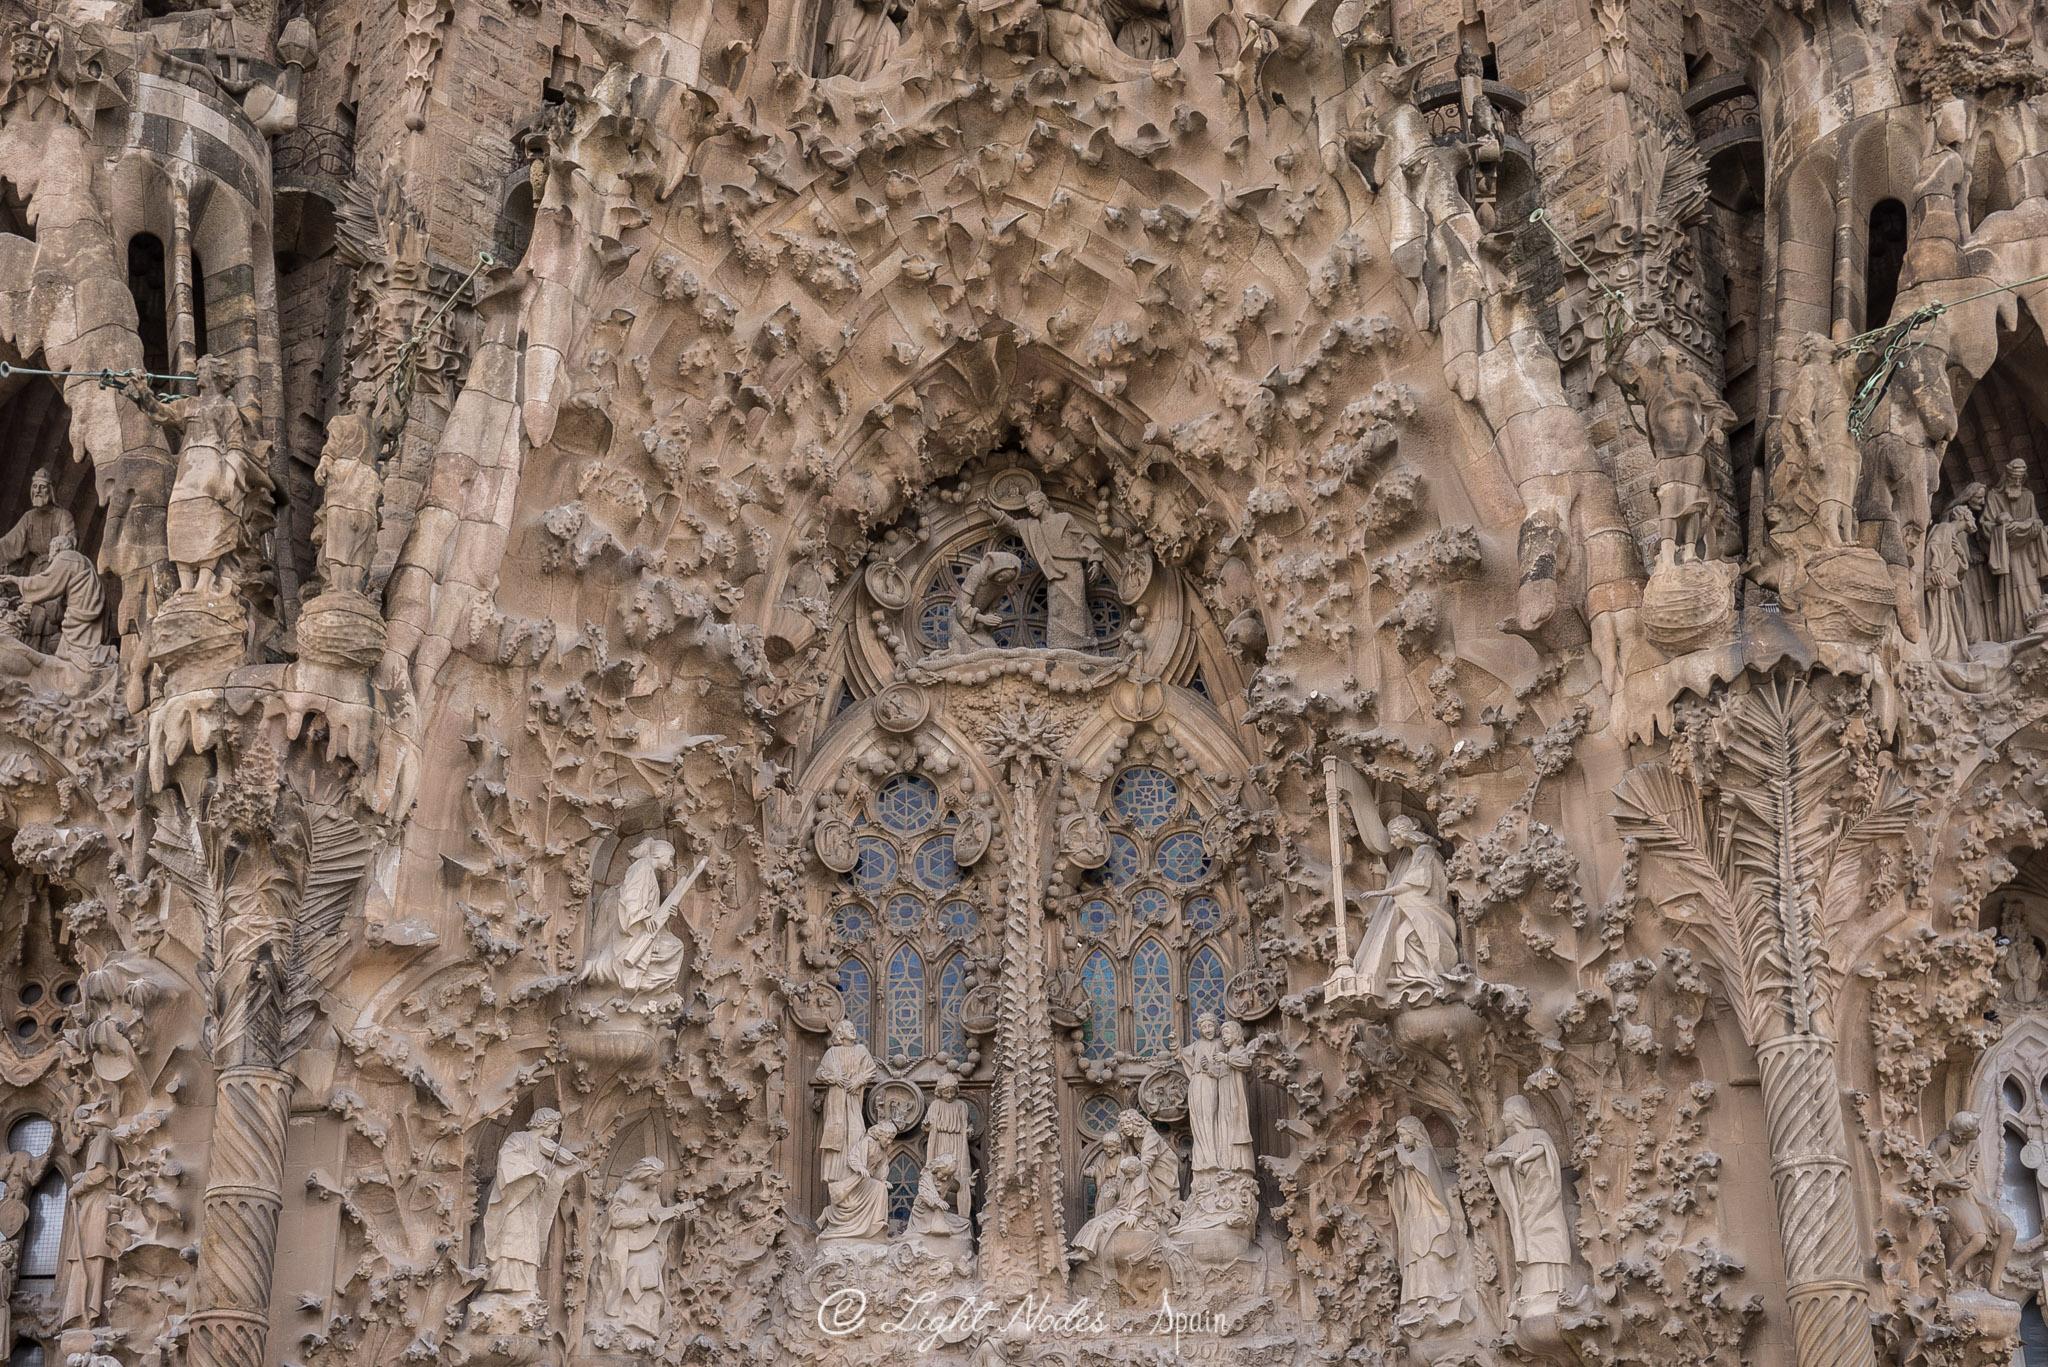 La Sagrada Família (Gaudi designed Church), Barcelona with GX7